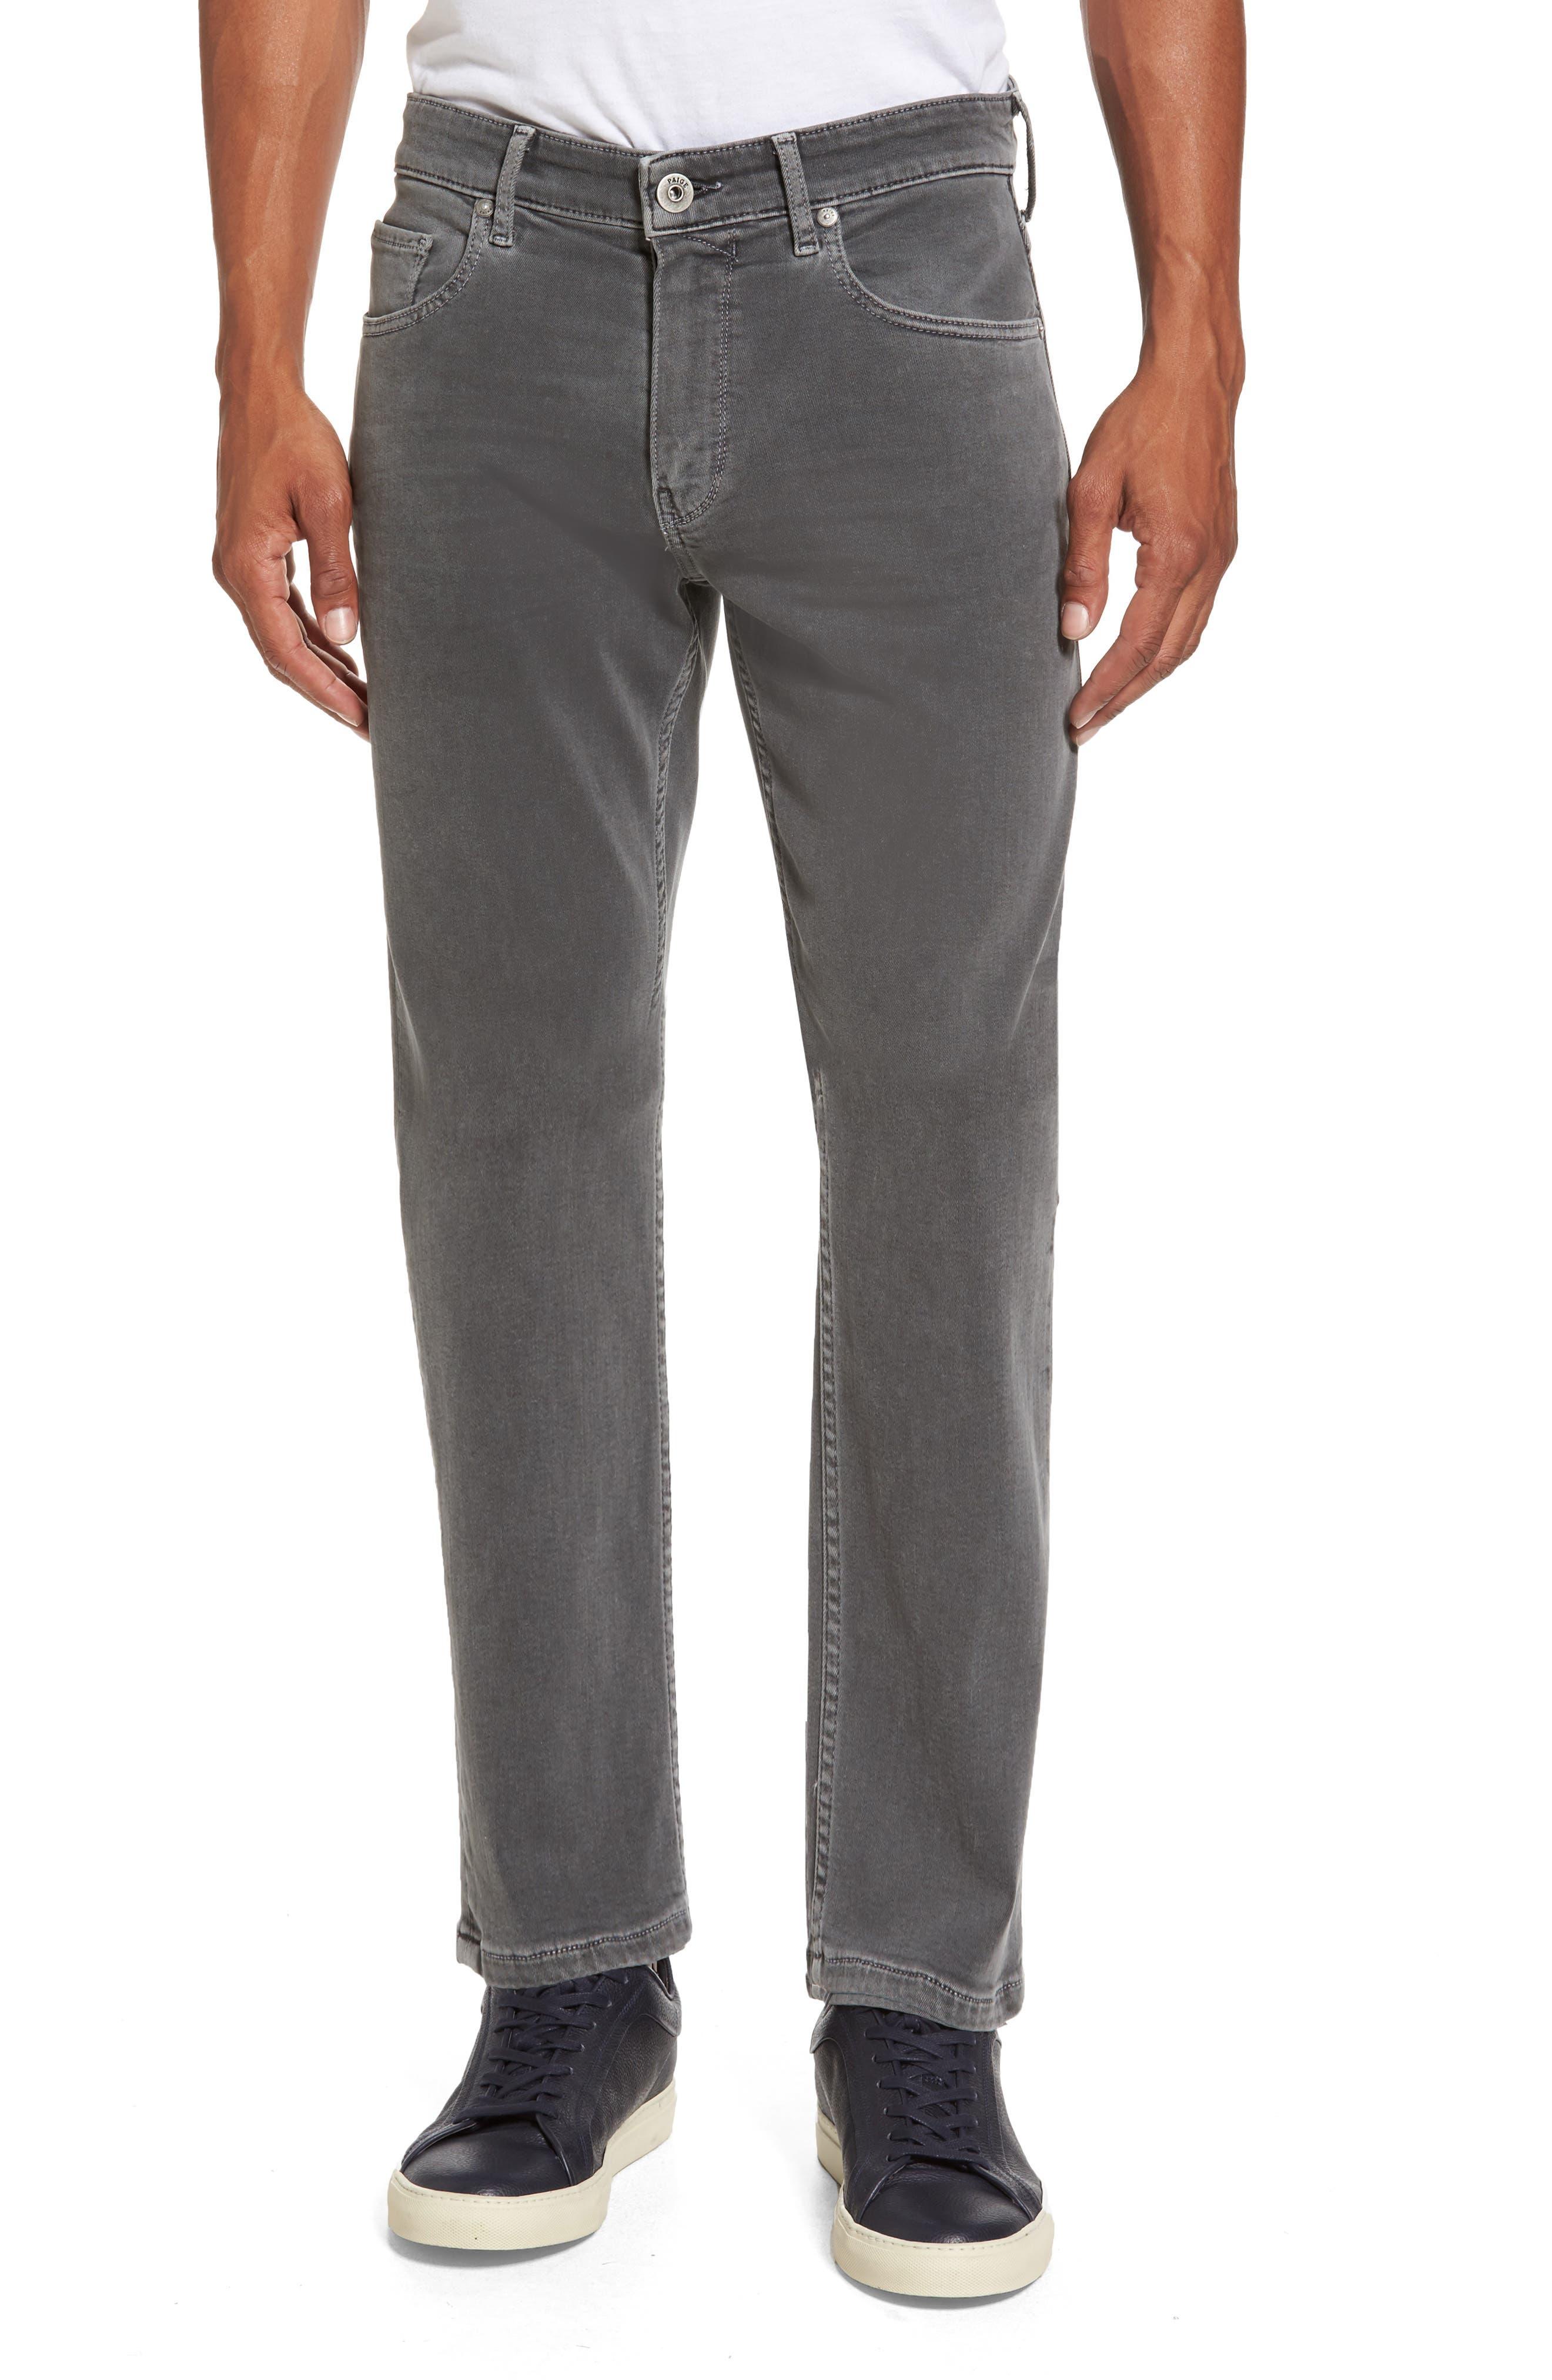 PAIGE Transcend - Federal Slim Straight Fit Jeans (Vintage Whitecap Grey)